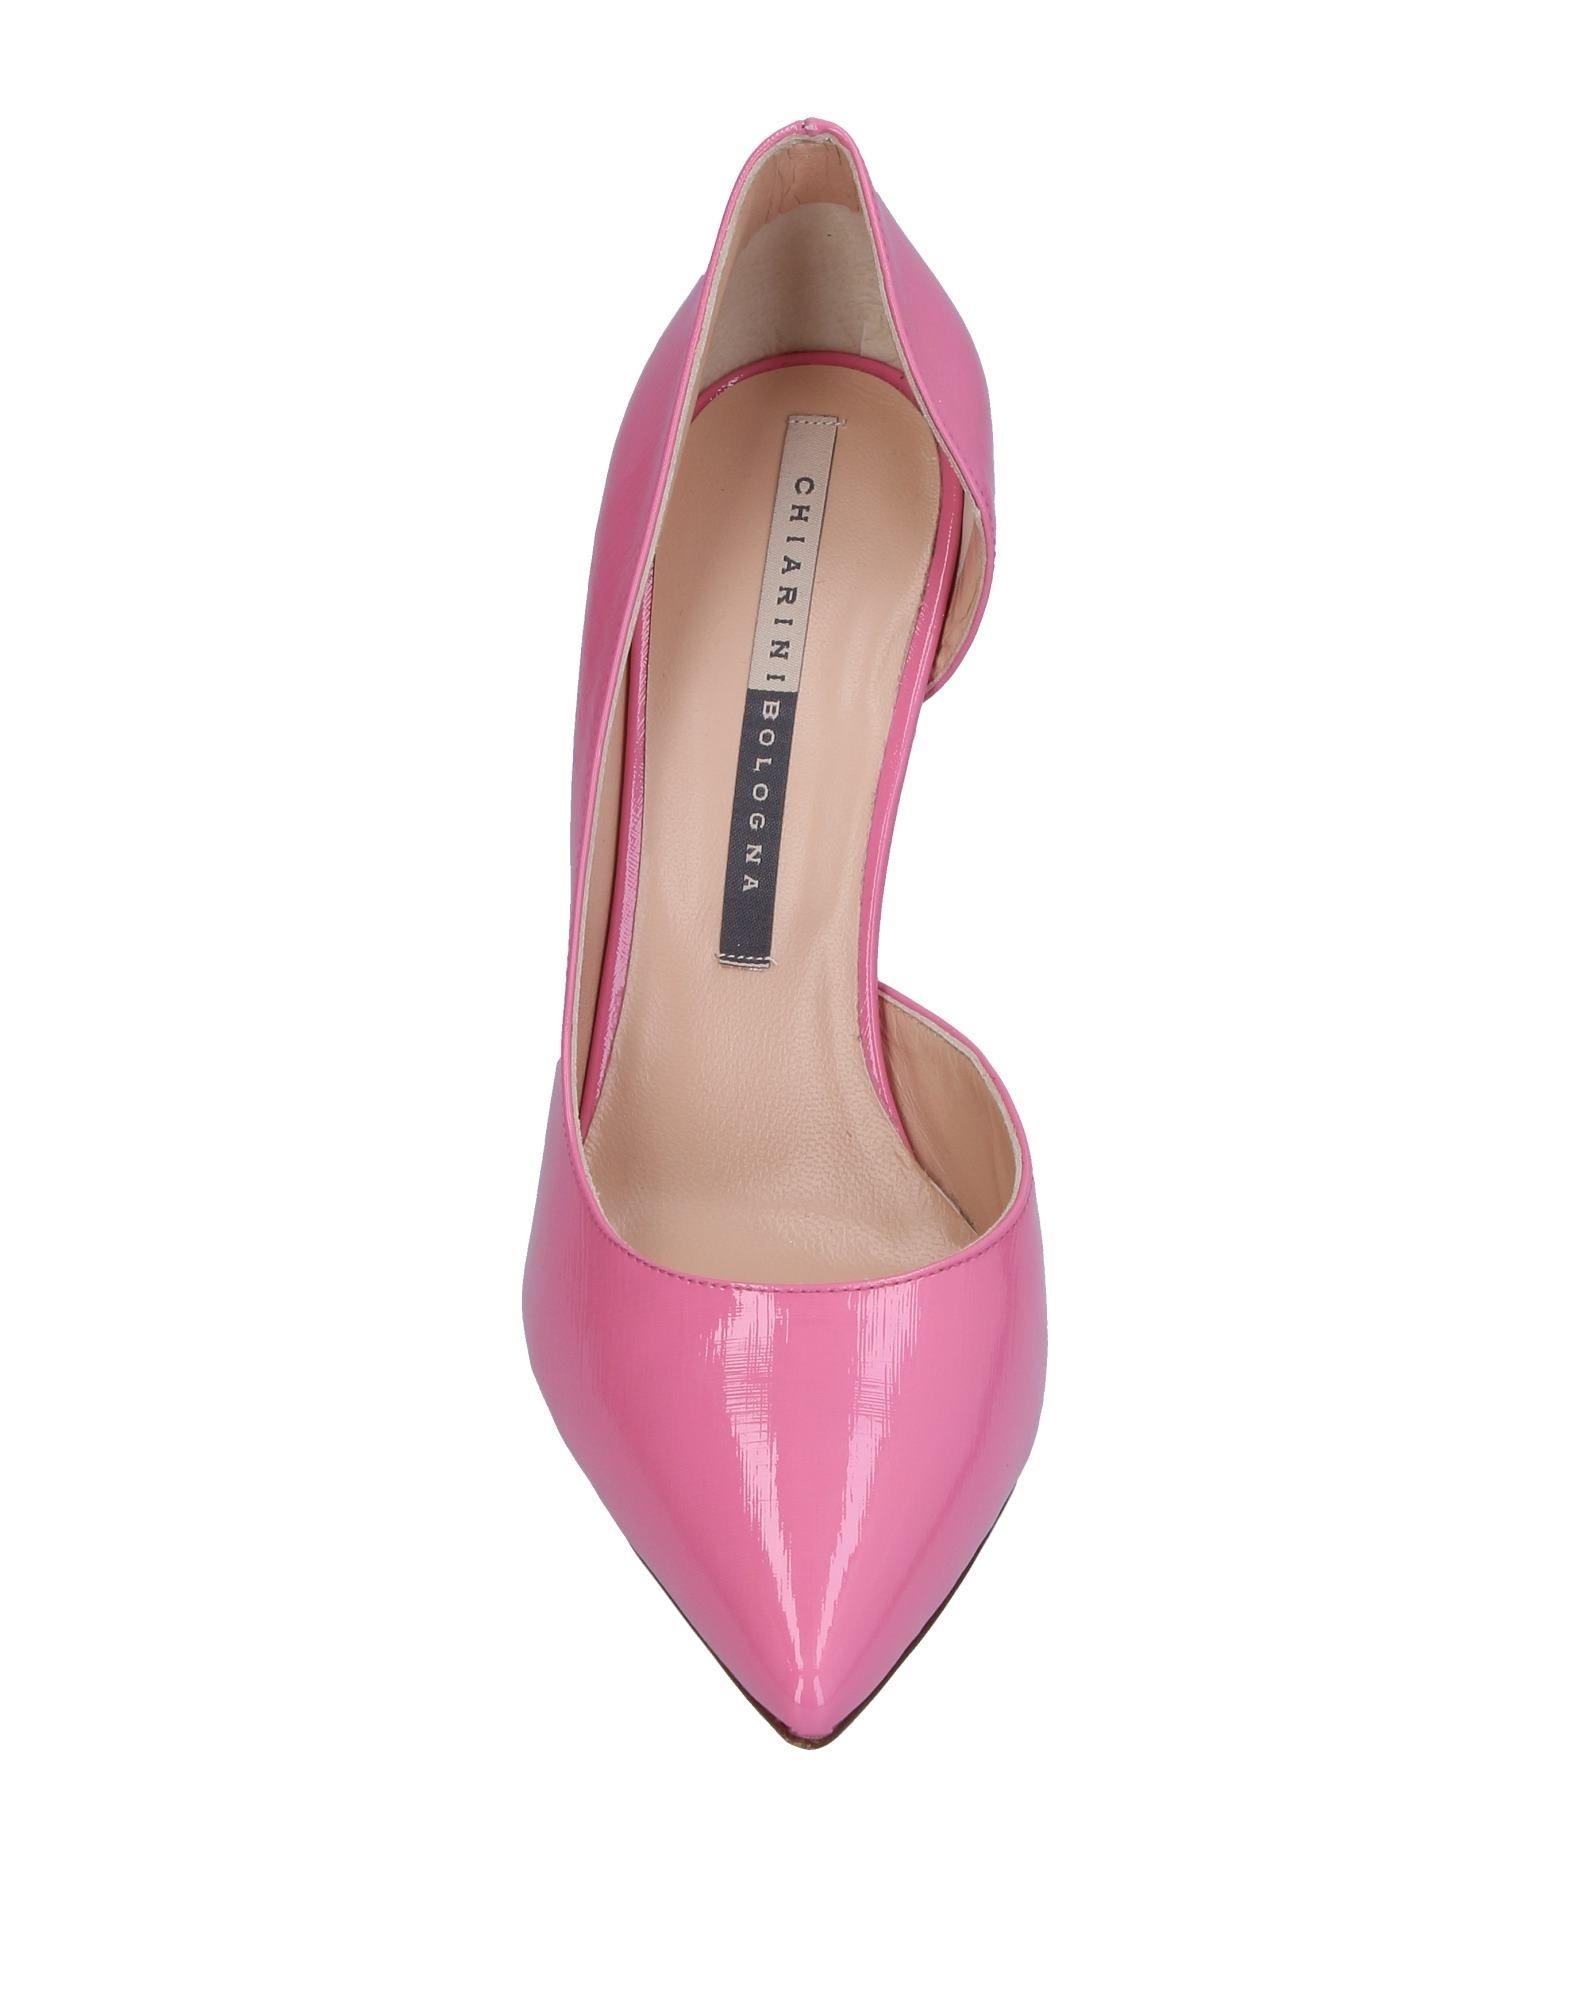 Chiarini Bologna Gute Pumps Damen  11372978RJ Gute Bologna Qualität beliebte Schuhe ad1c89